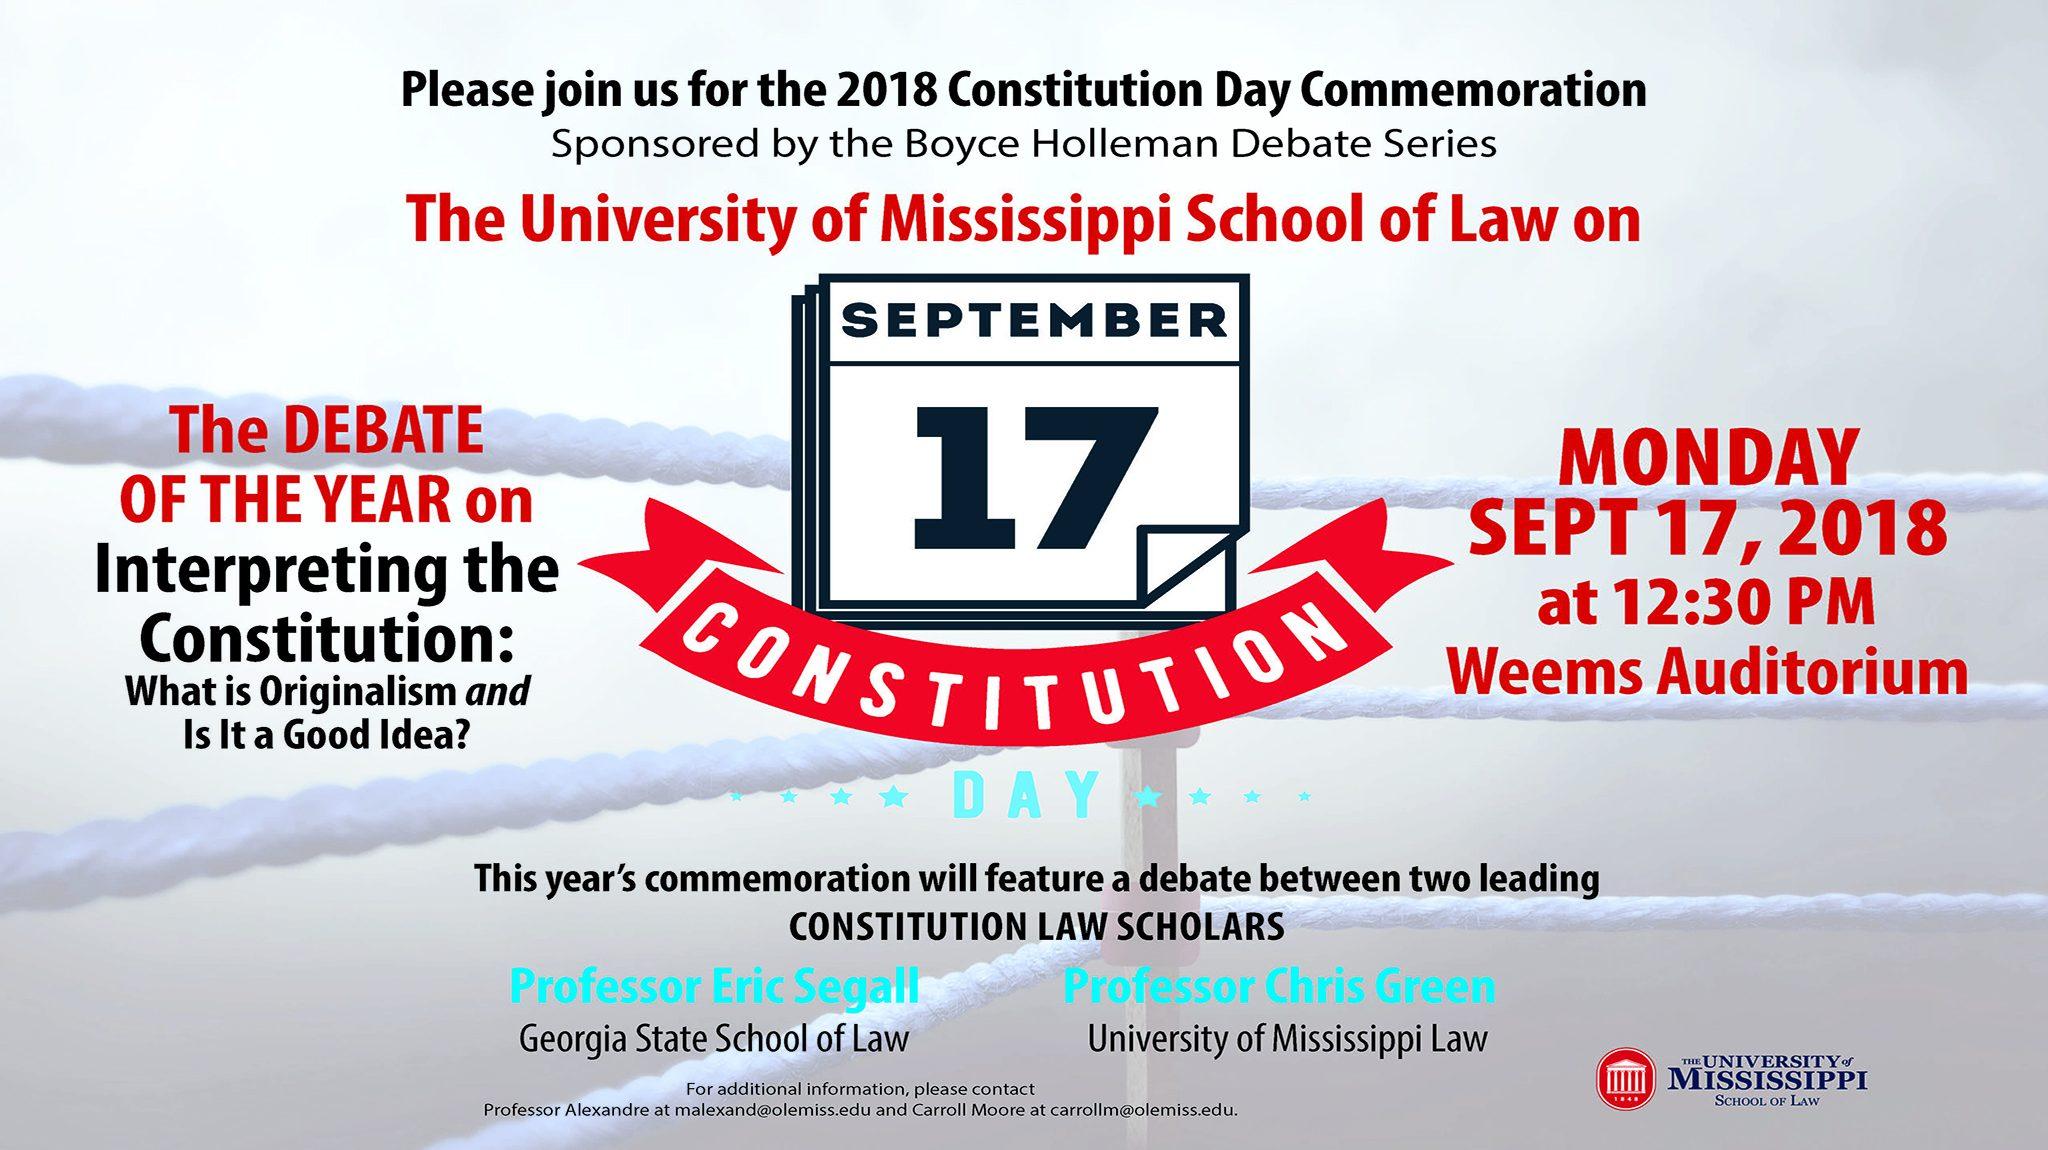 law school to host originalism debate in constitution day observance